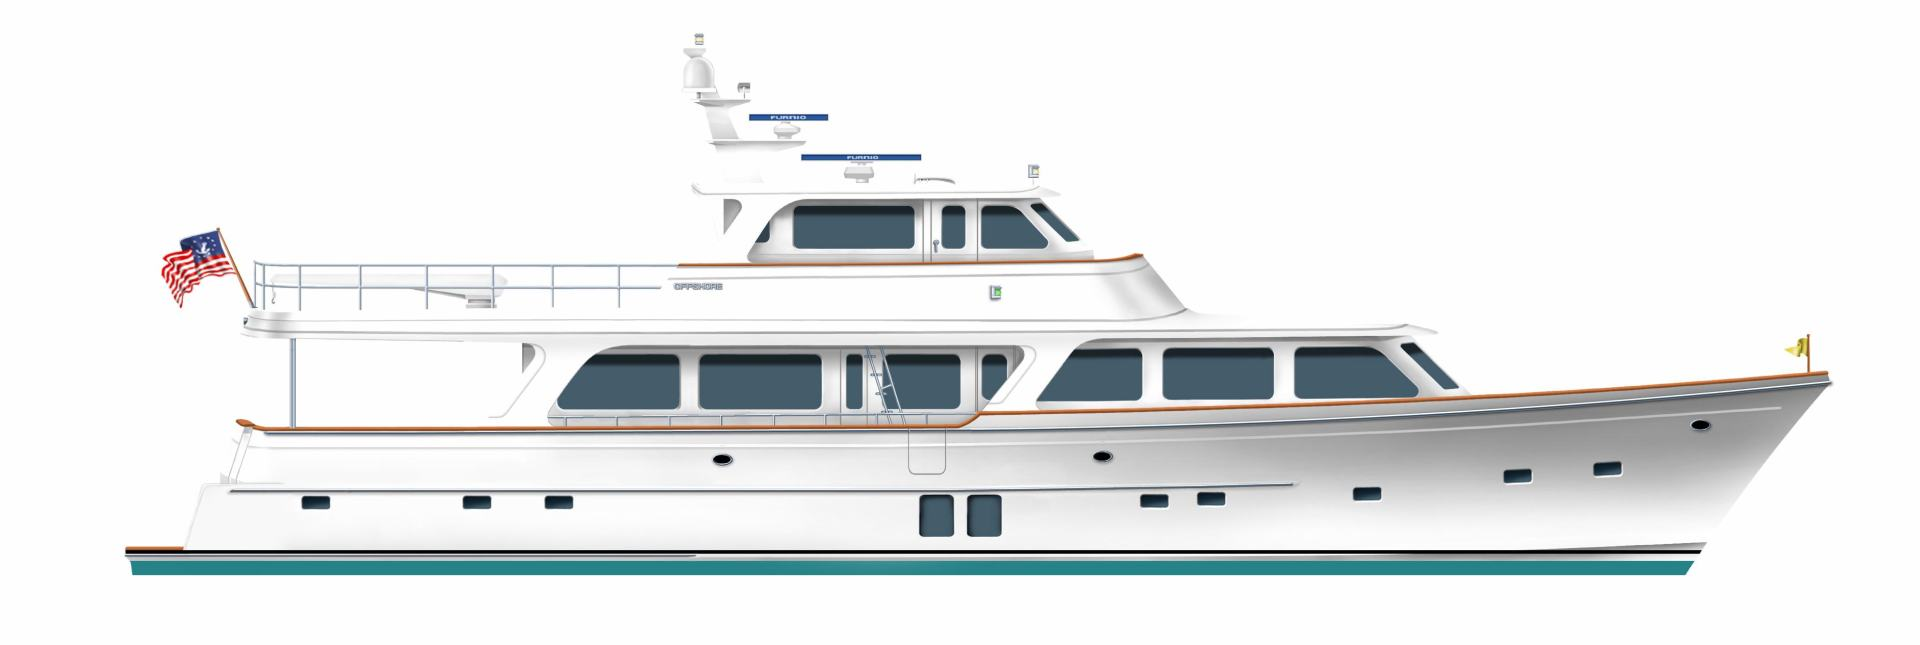 Offshore Yachts-Motoryacht 2020 -United States-1178677   Thumbnail